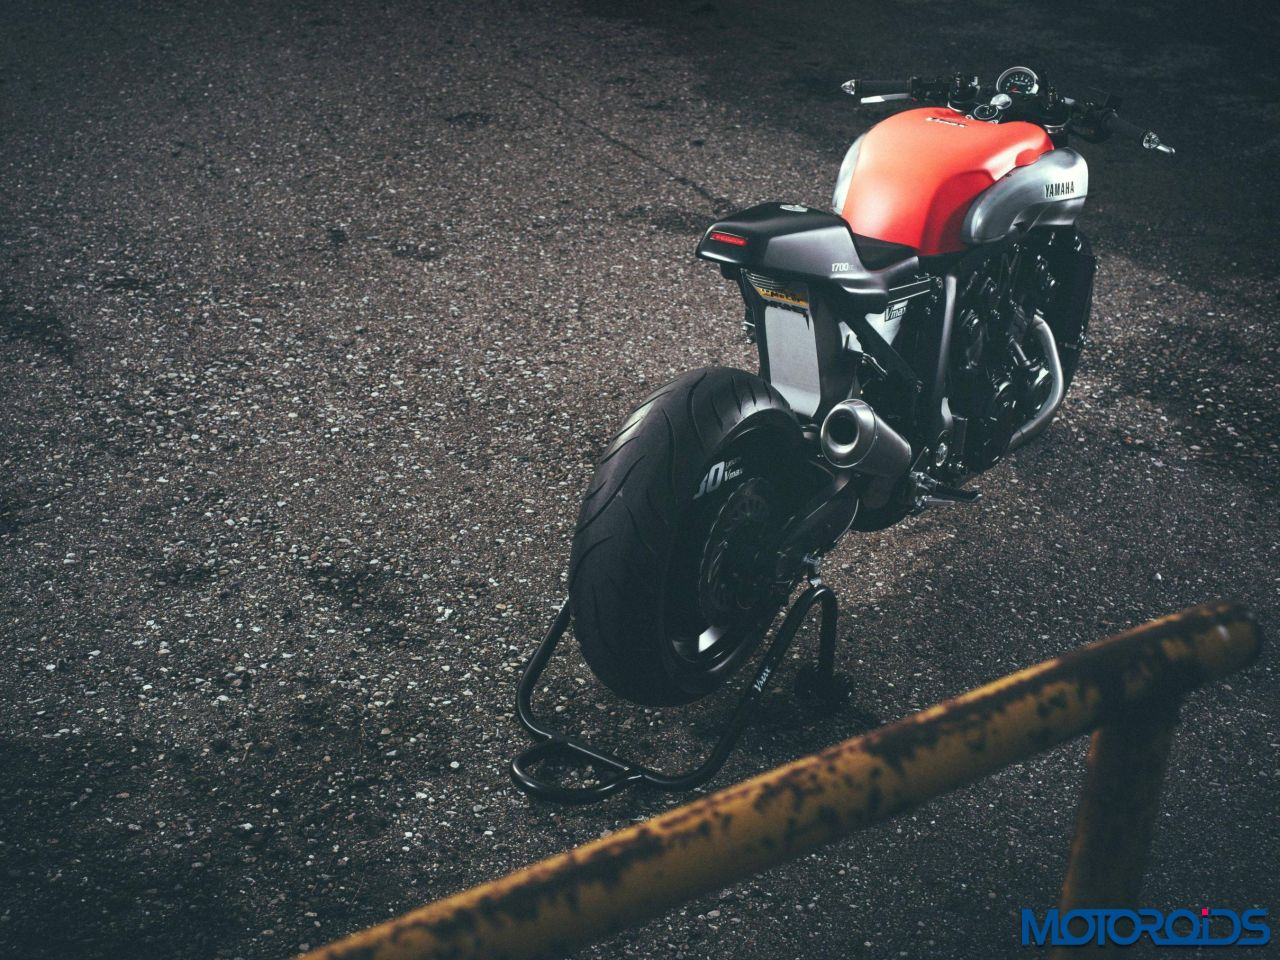 Jvb Moto Yamaha Vmax Official Image 2 Motoroids Com